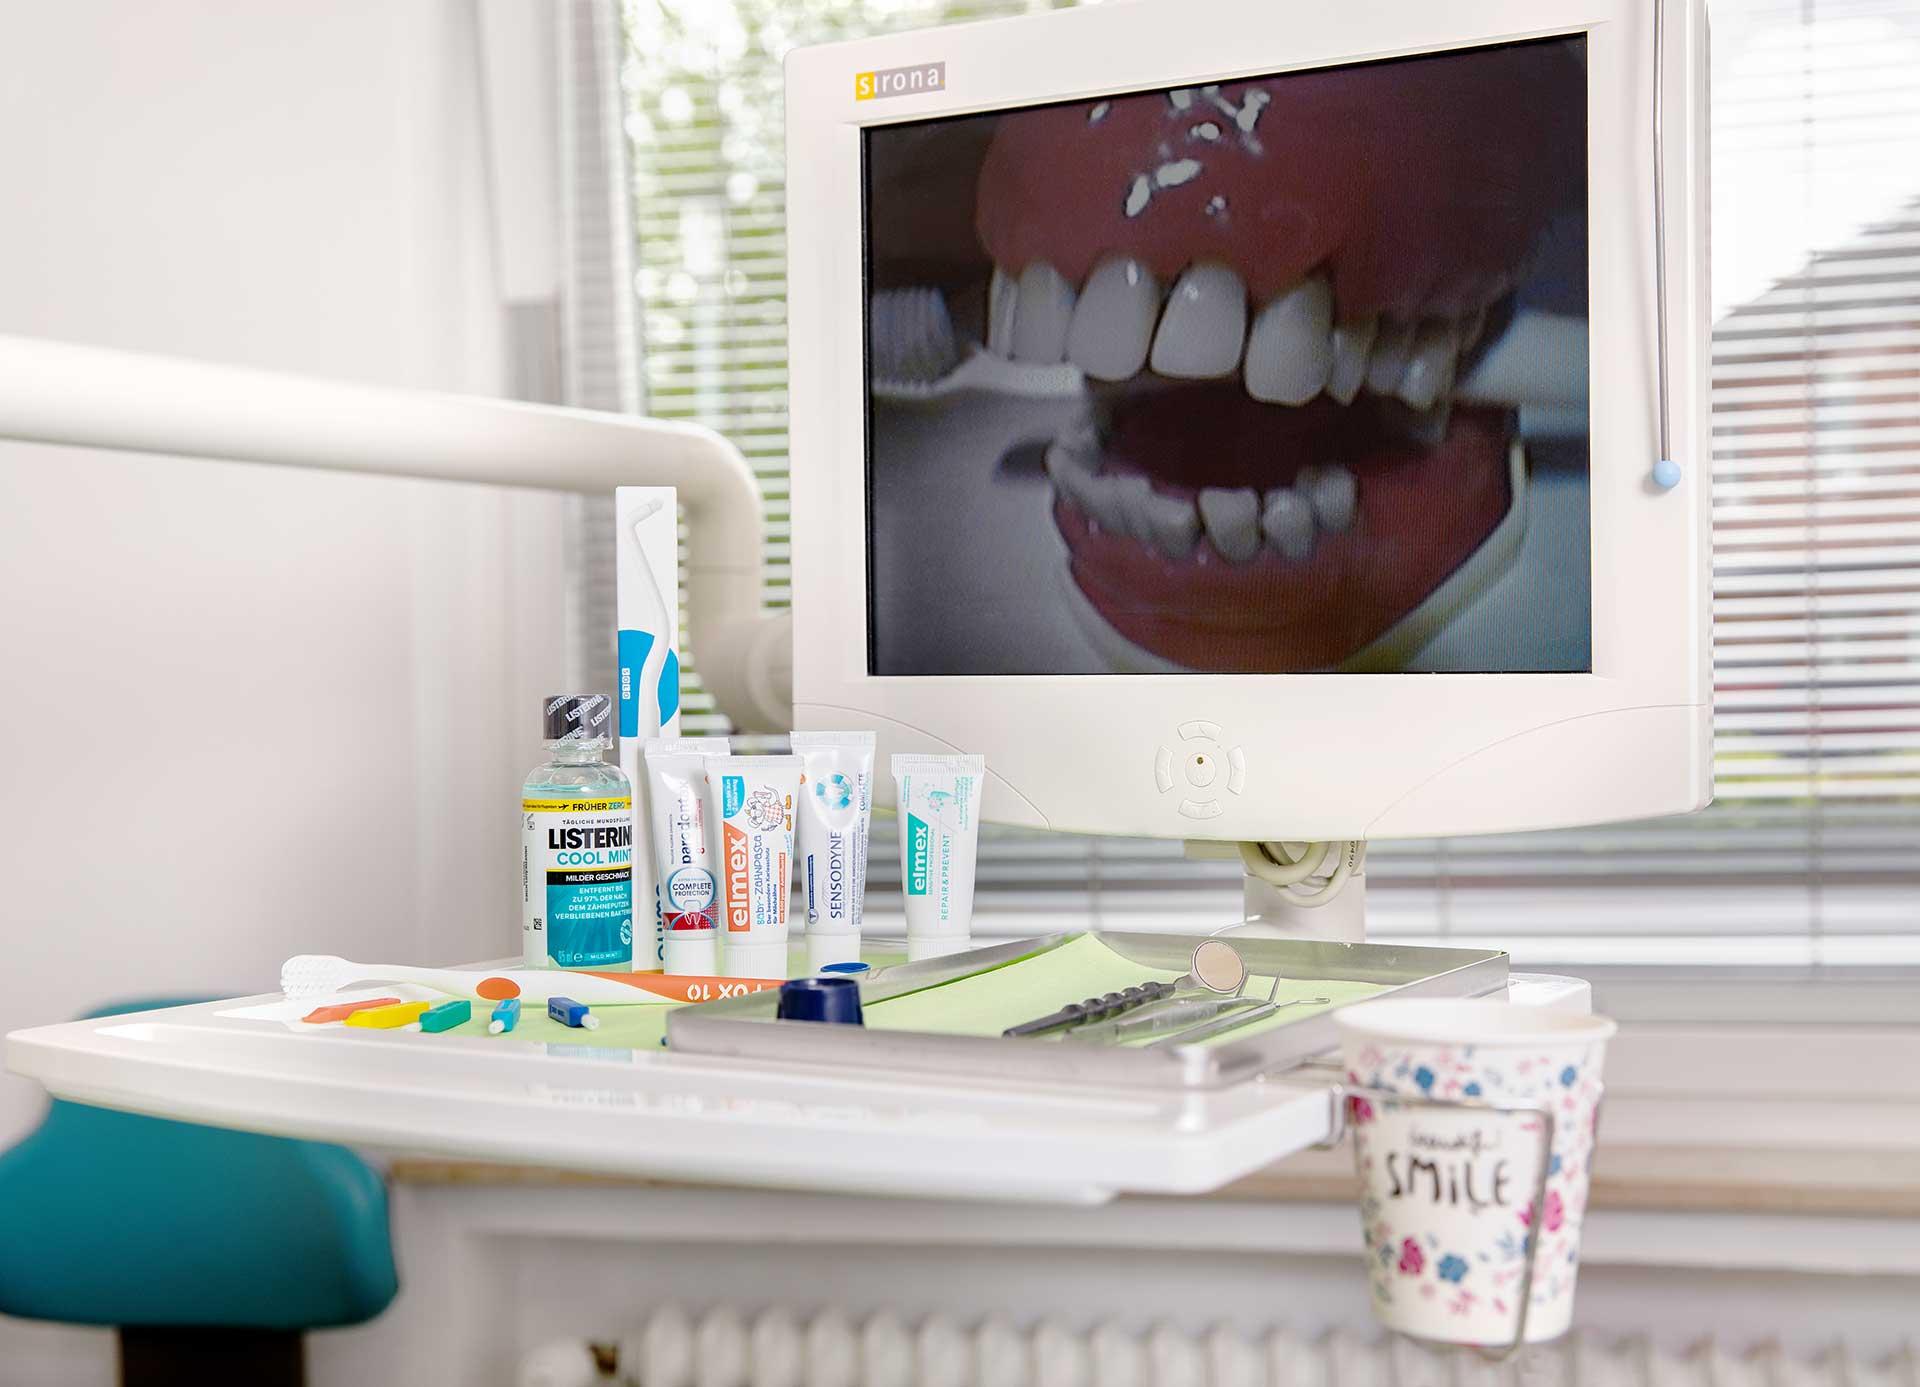 Behandlungsstuhl in der Zahnarztpraxis Jan Vijfvinkel